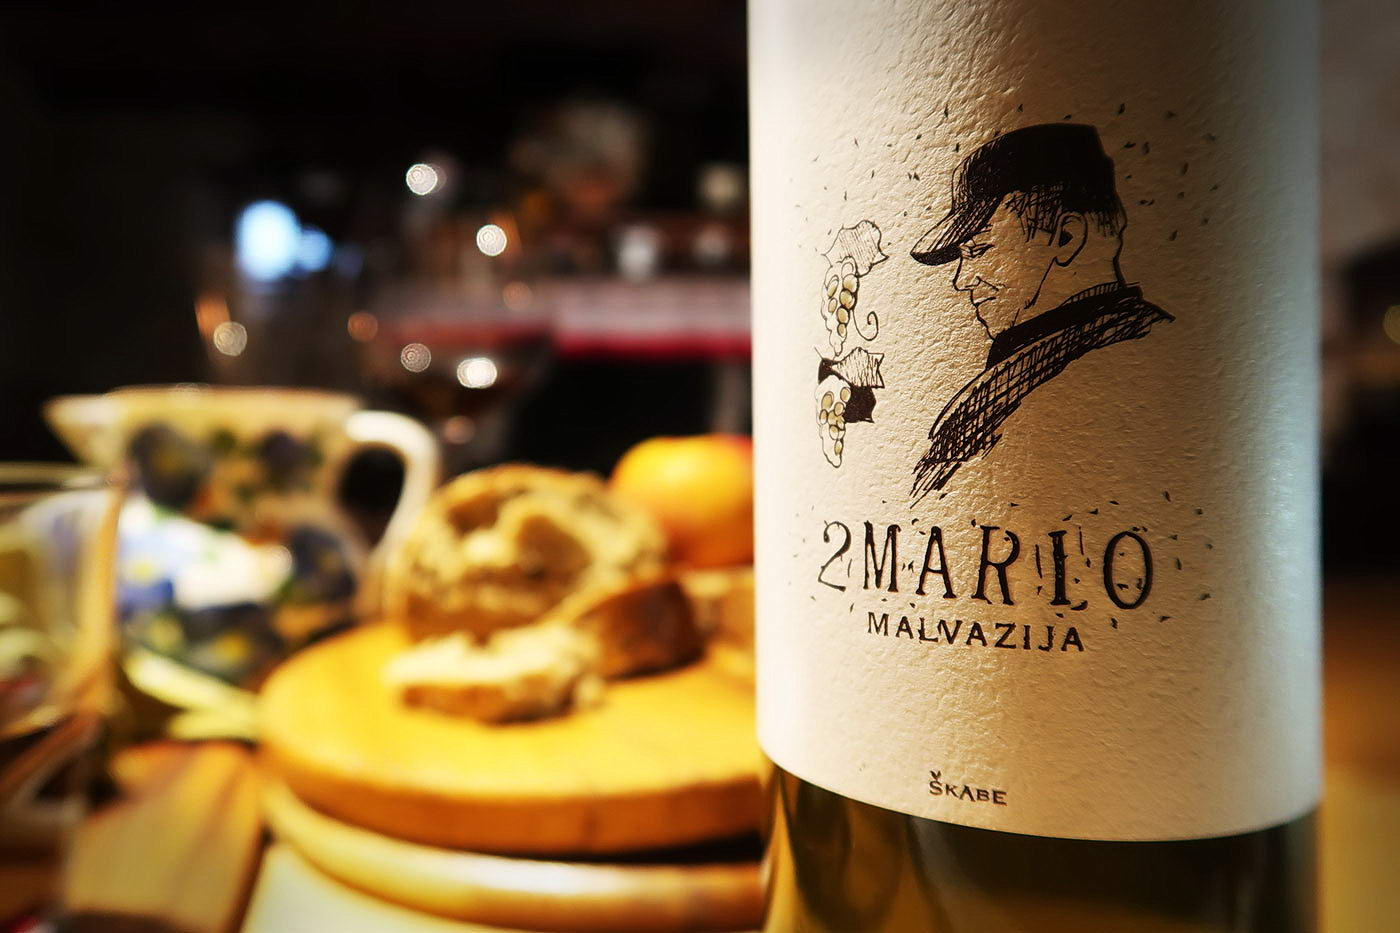 2Mario Malvazija - Natural Wine by Skabe